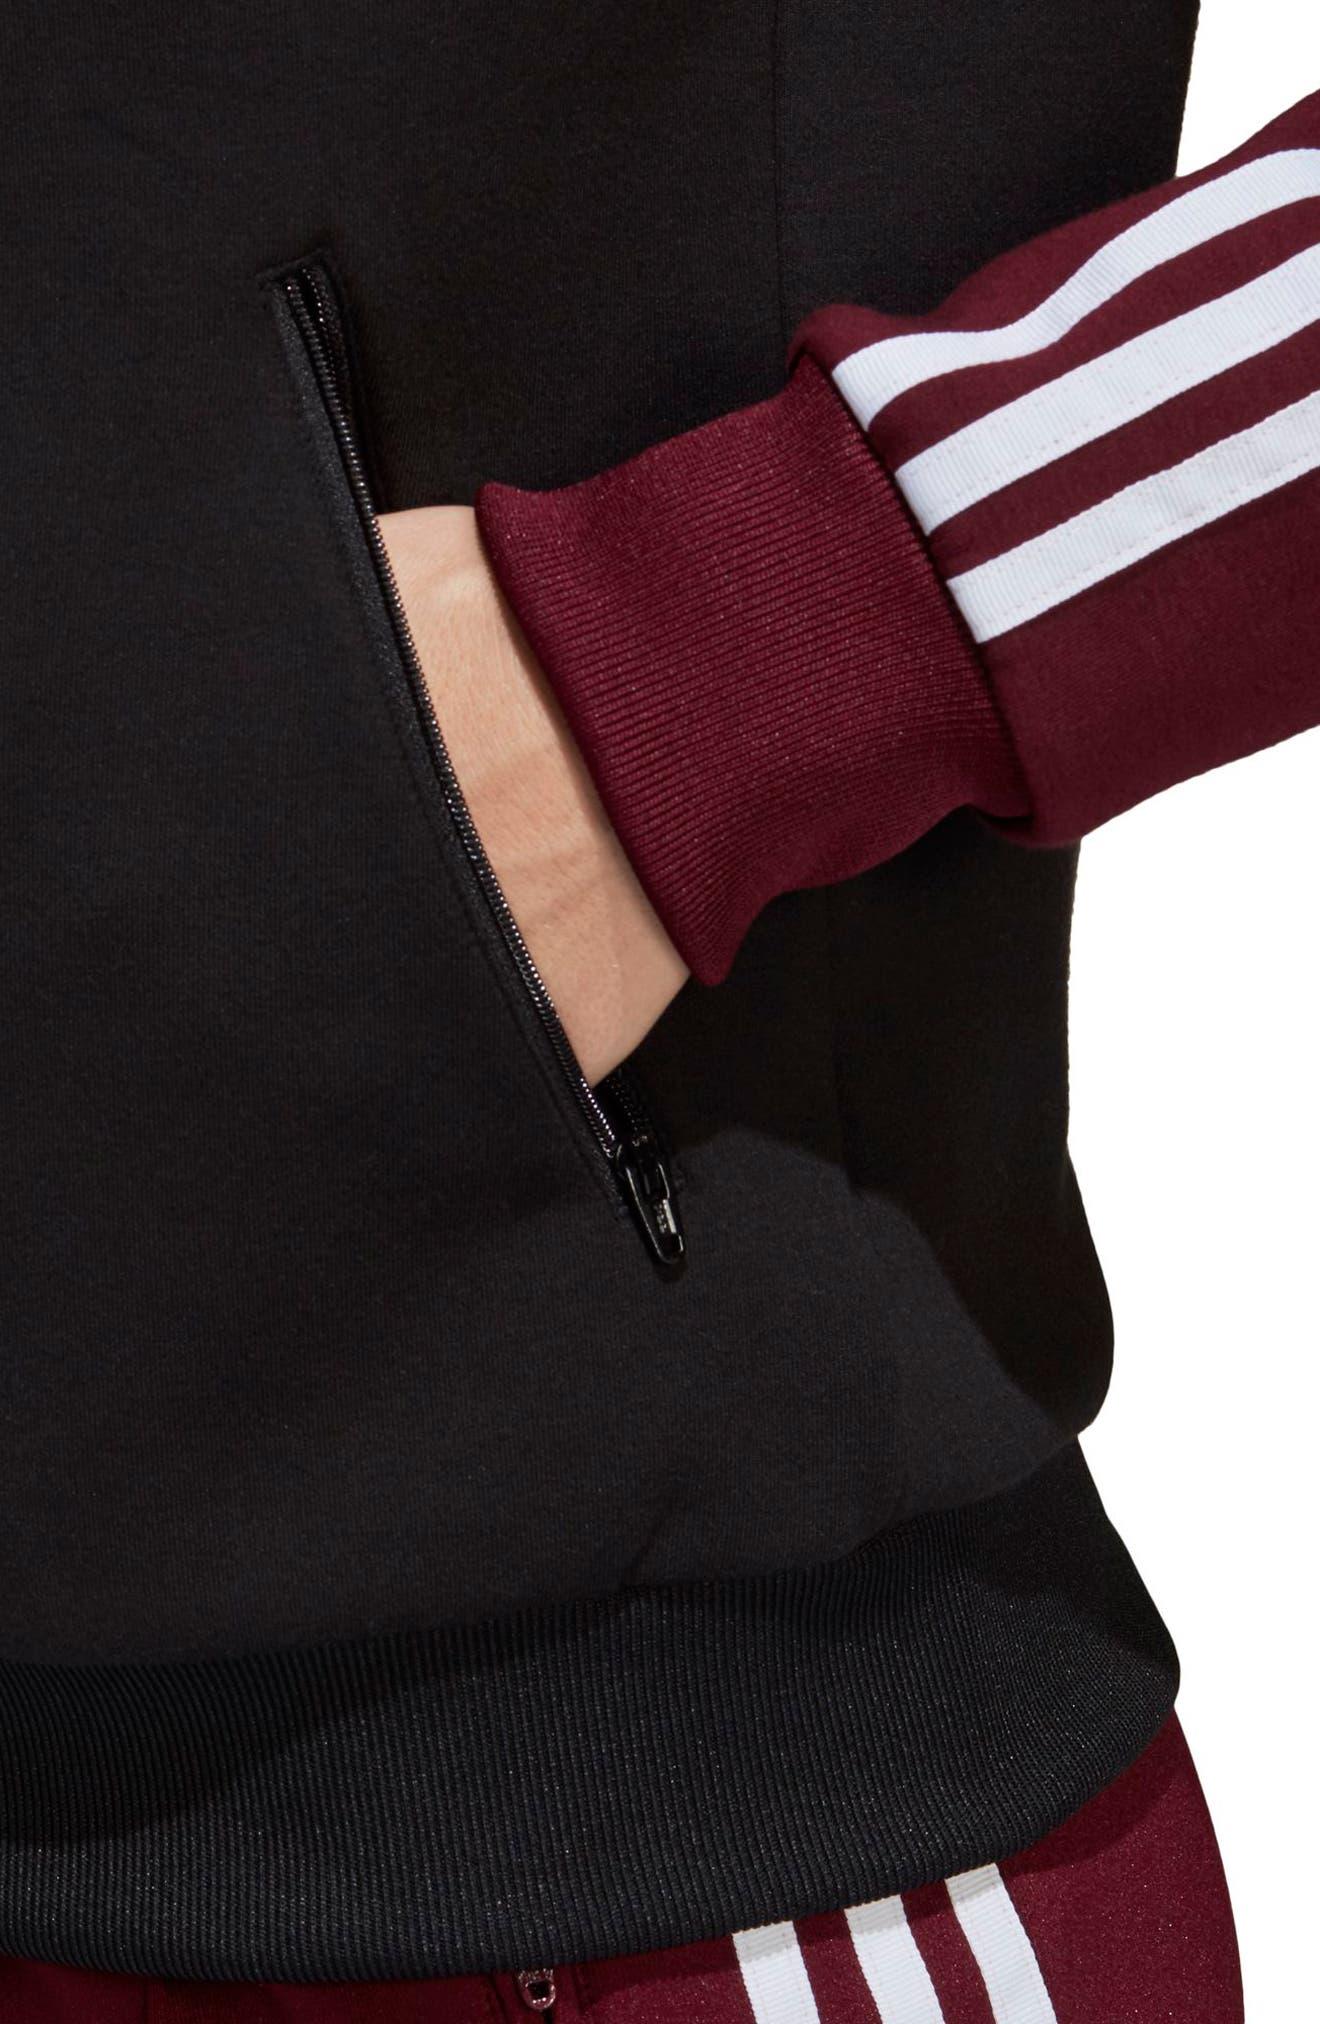 CLRDO SST Track Jacket,                             Alternate thumbnail 4, color,                             930